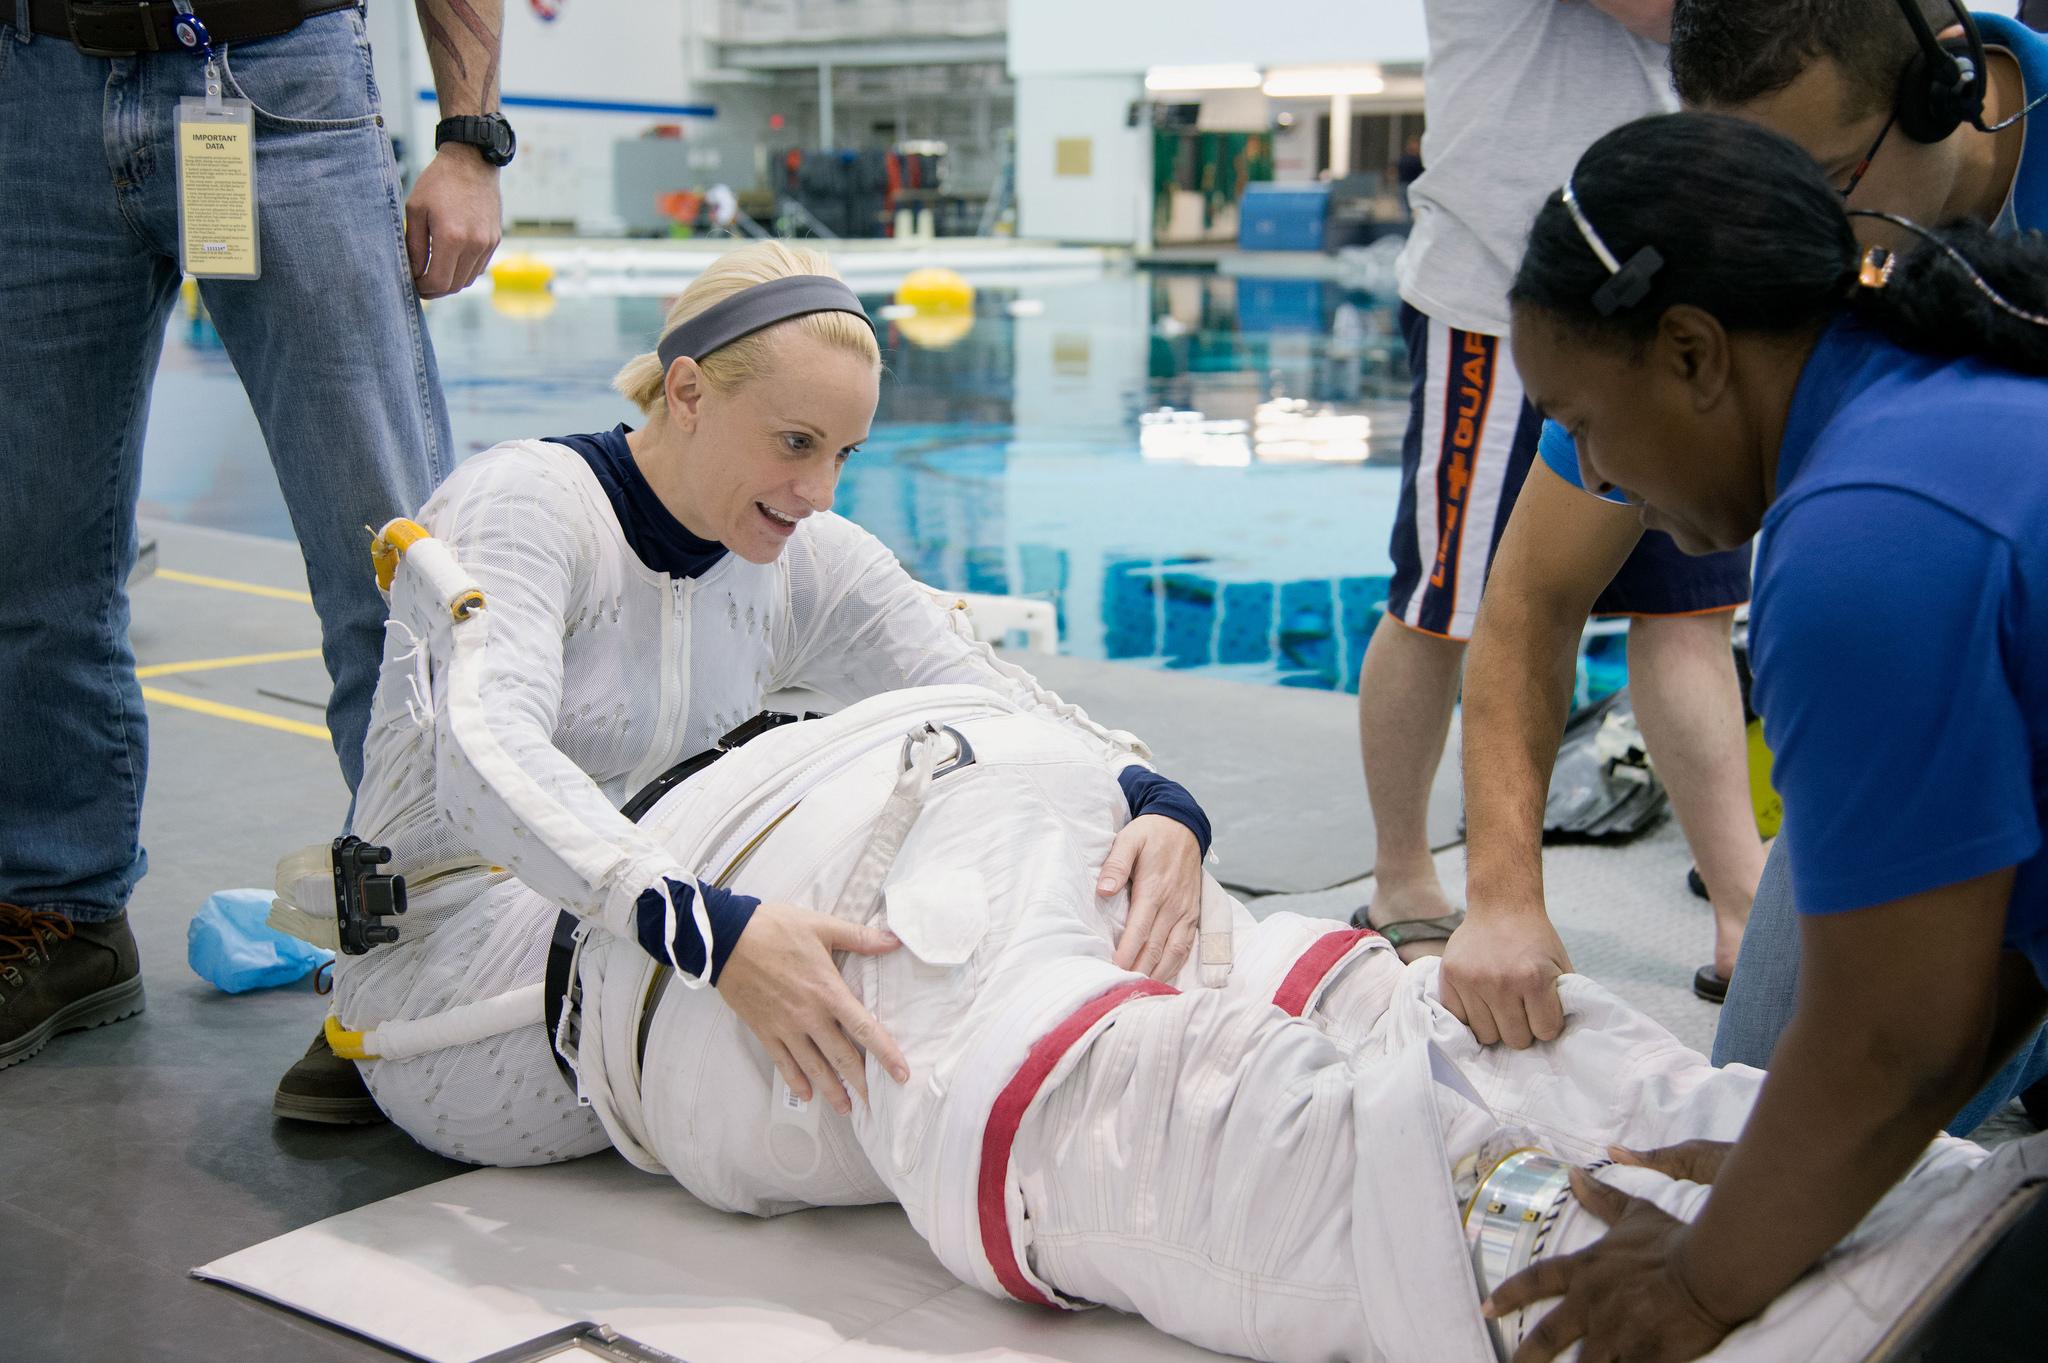 Kate Rubins undergoes spacewalk training at NASA's Neutral Buoyancy Laboratory.